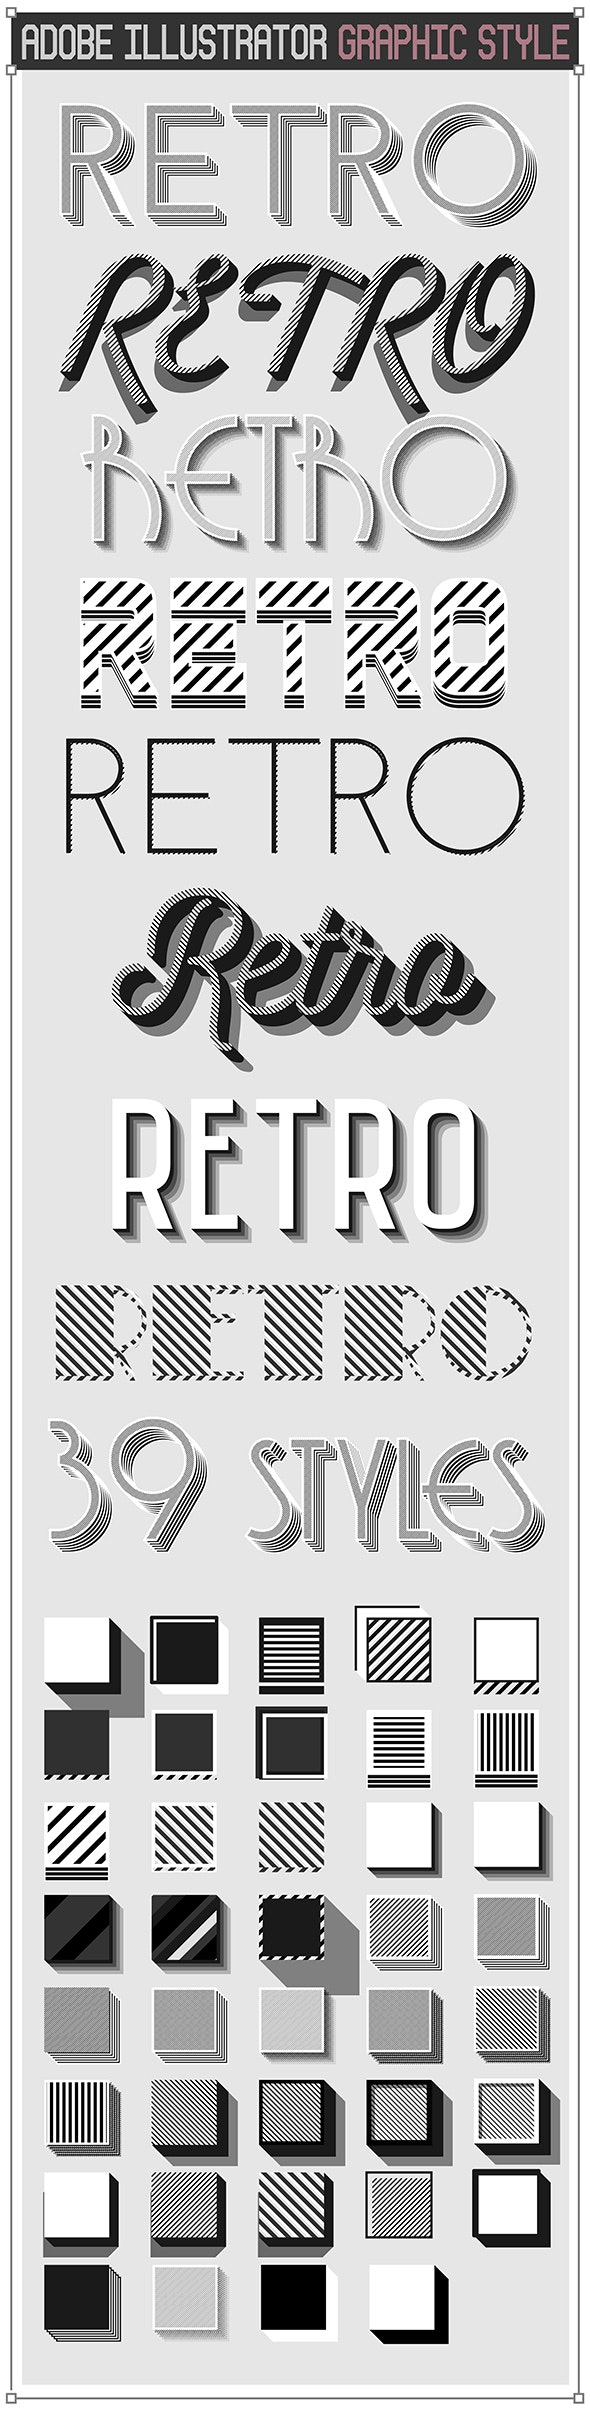 Vector Retro Vintage Black and White Text Styles - Styles Illustrator